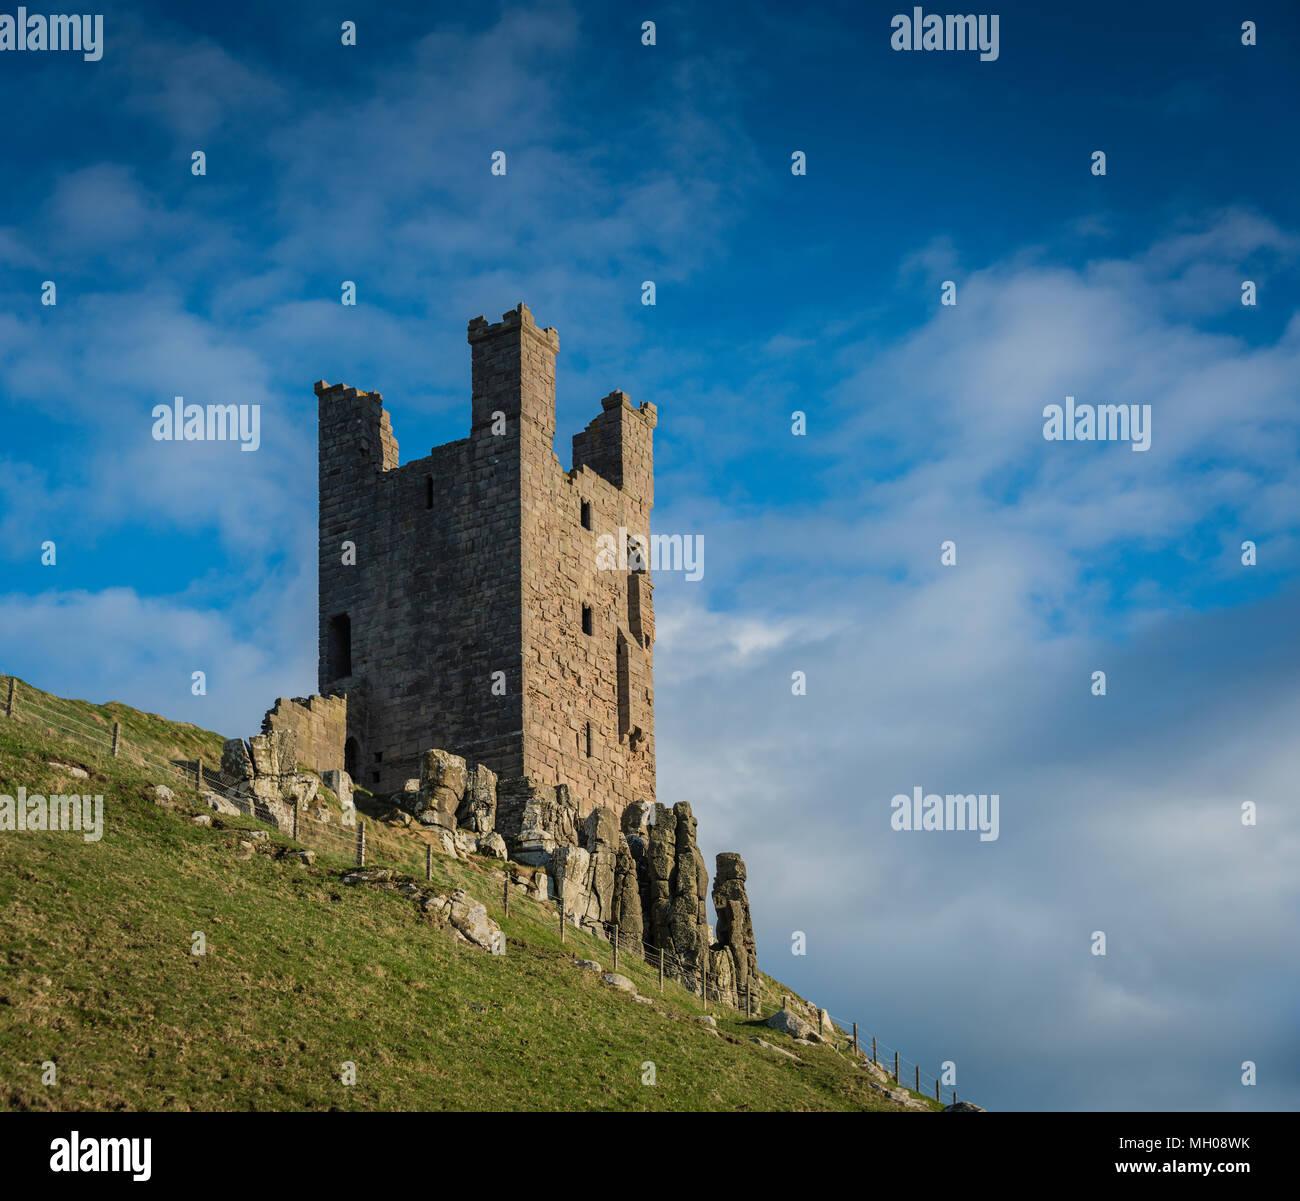 Lilburn Tower, Dunstanburgh Castle, Northumberland, UK. - Stock Image